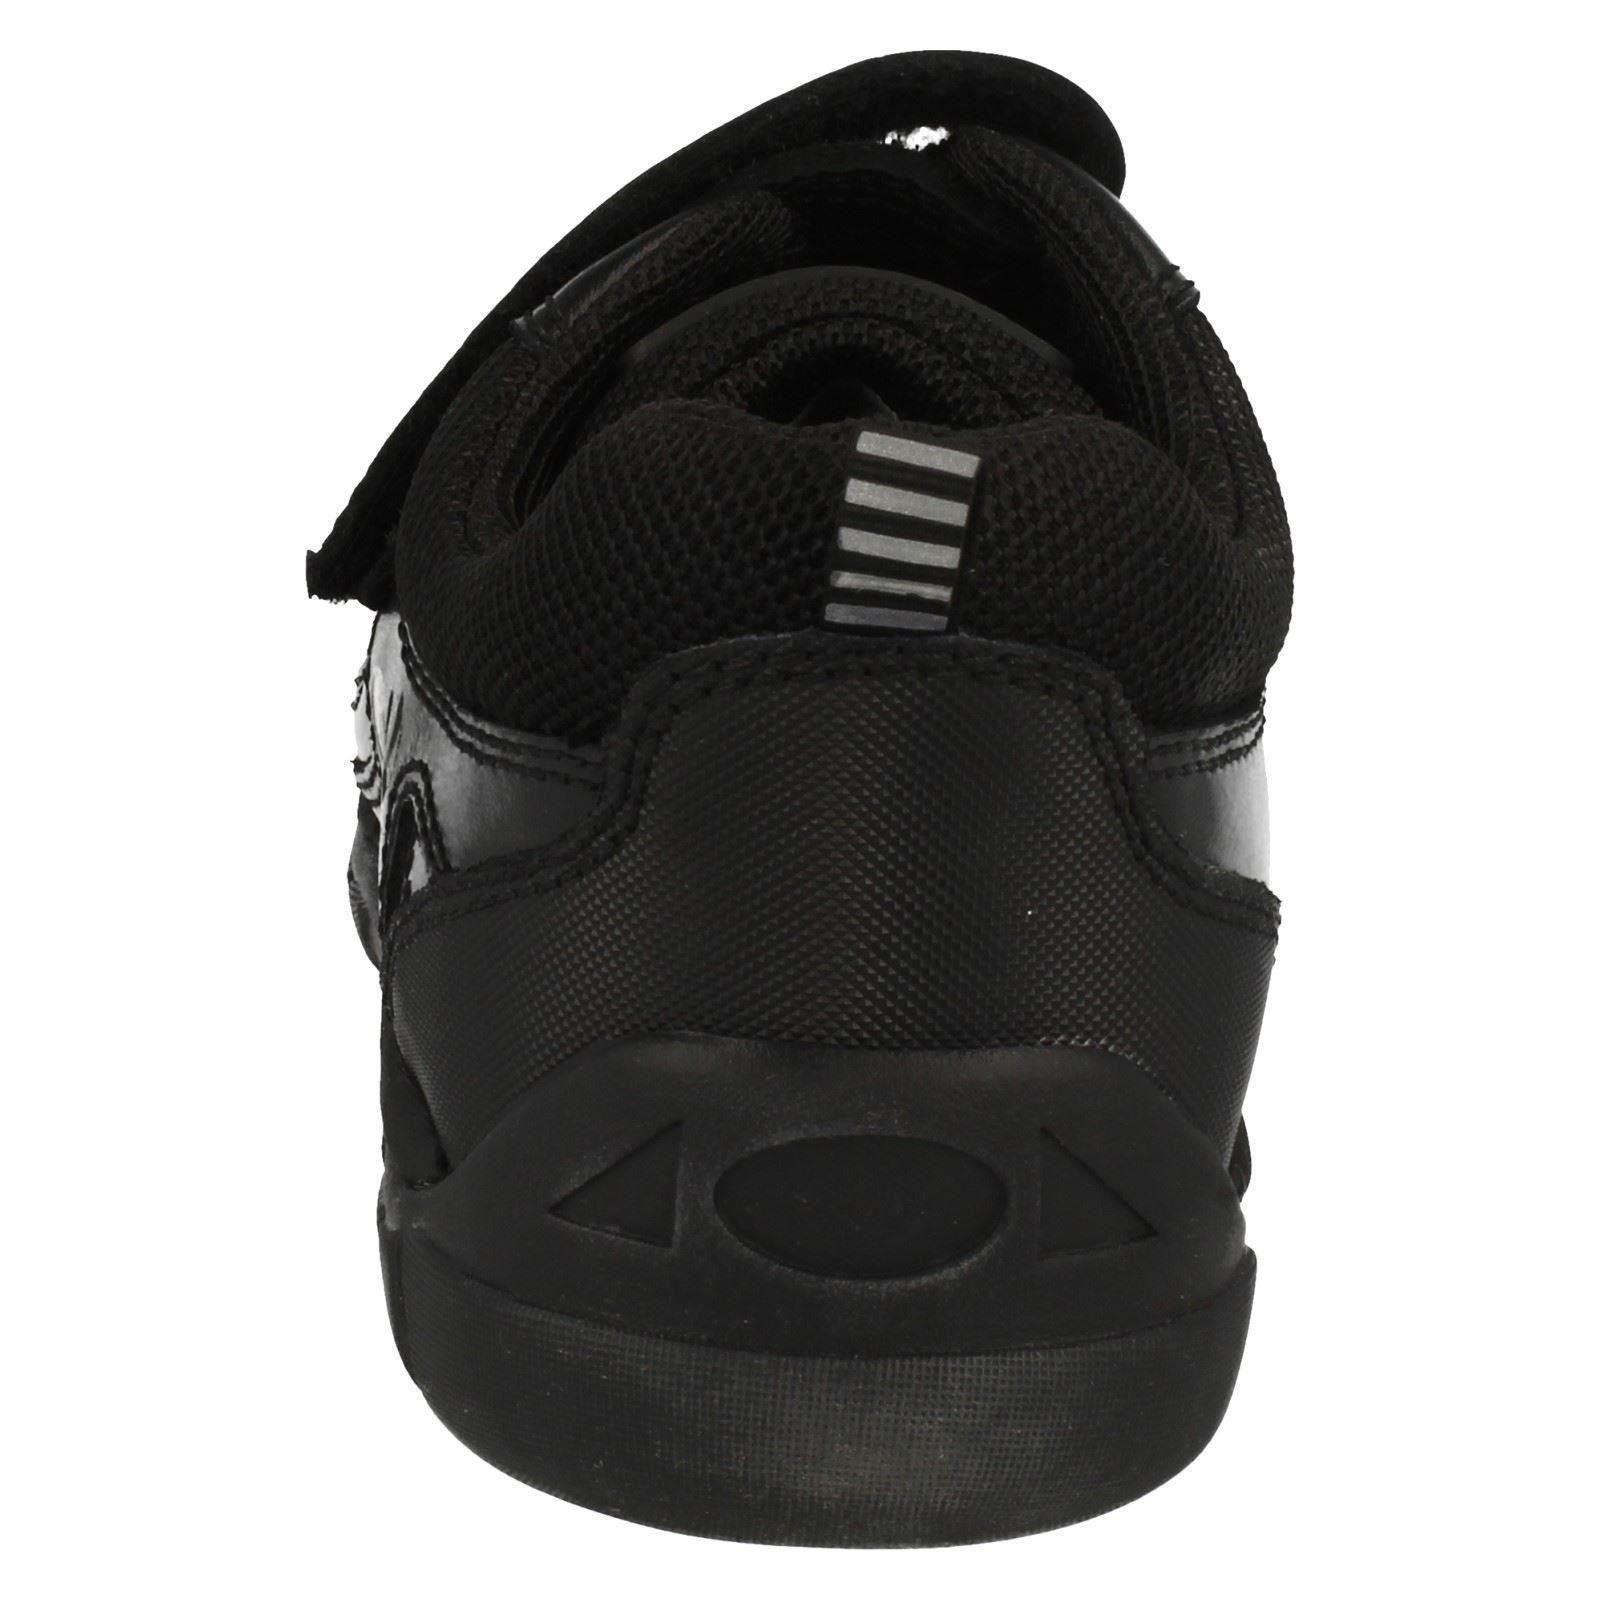 Senior Boys Rhino by Startrite Oliver School Shoes